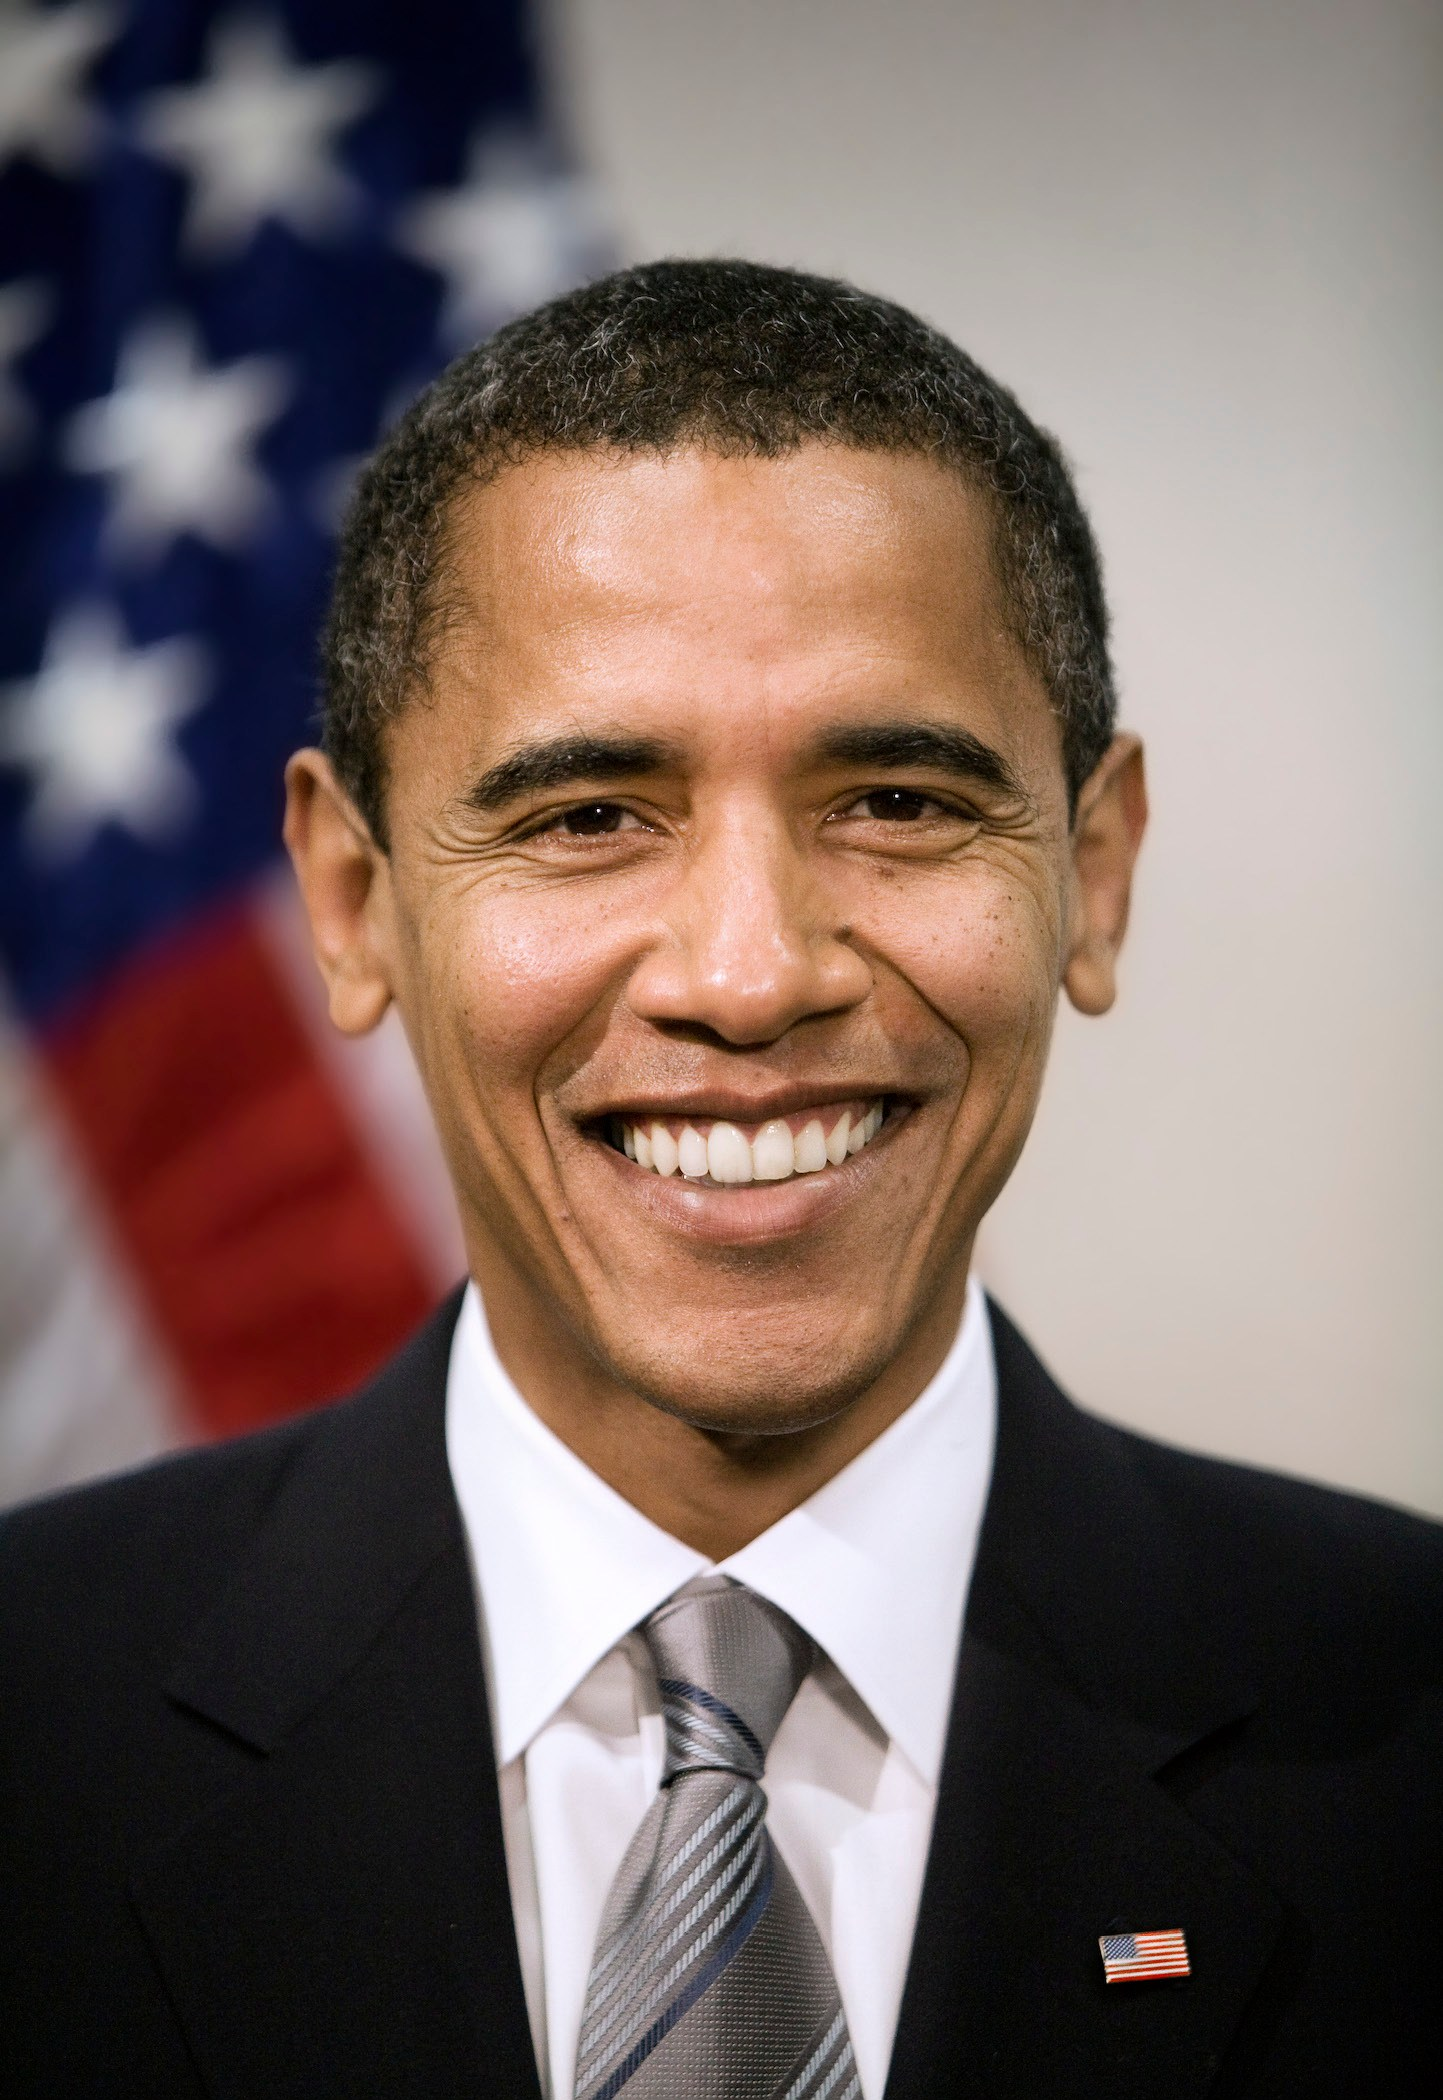 poster-sized_portrait_of_barack_obama_origres